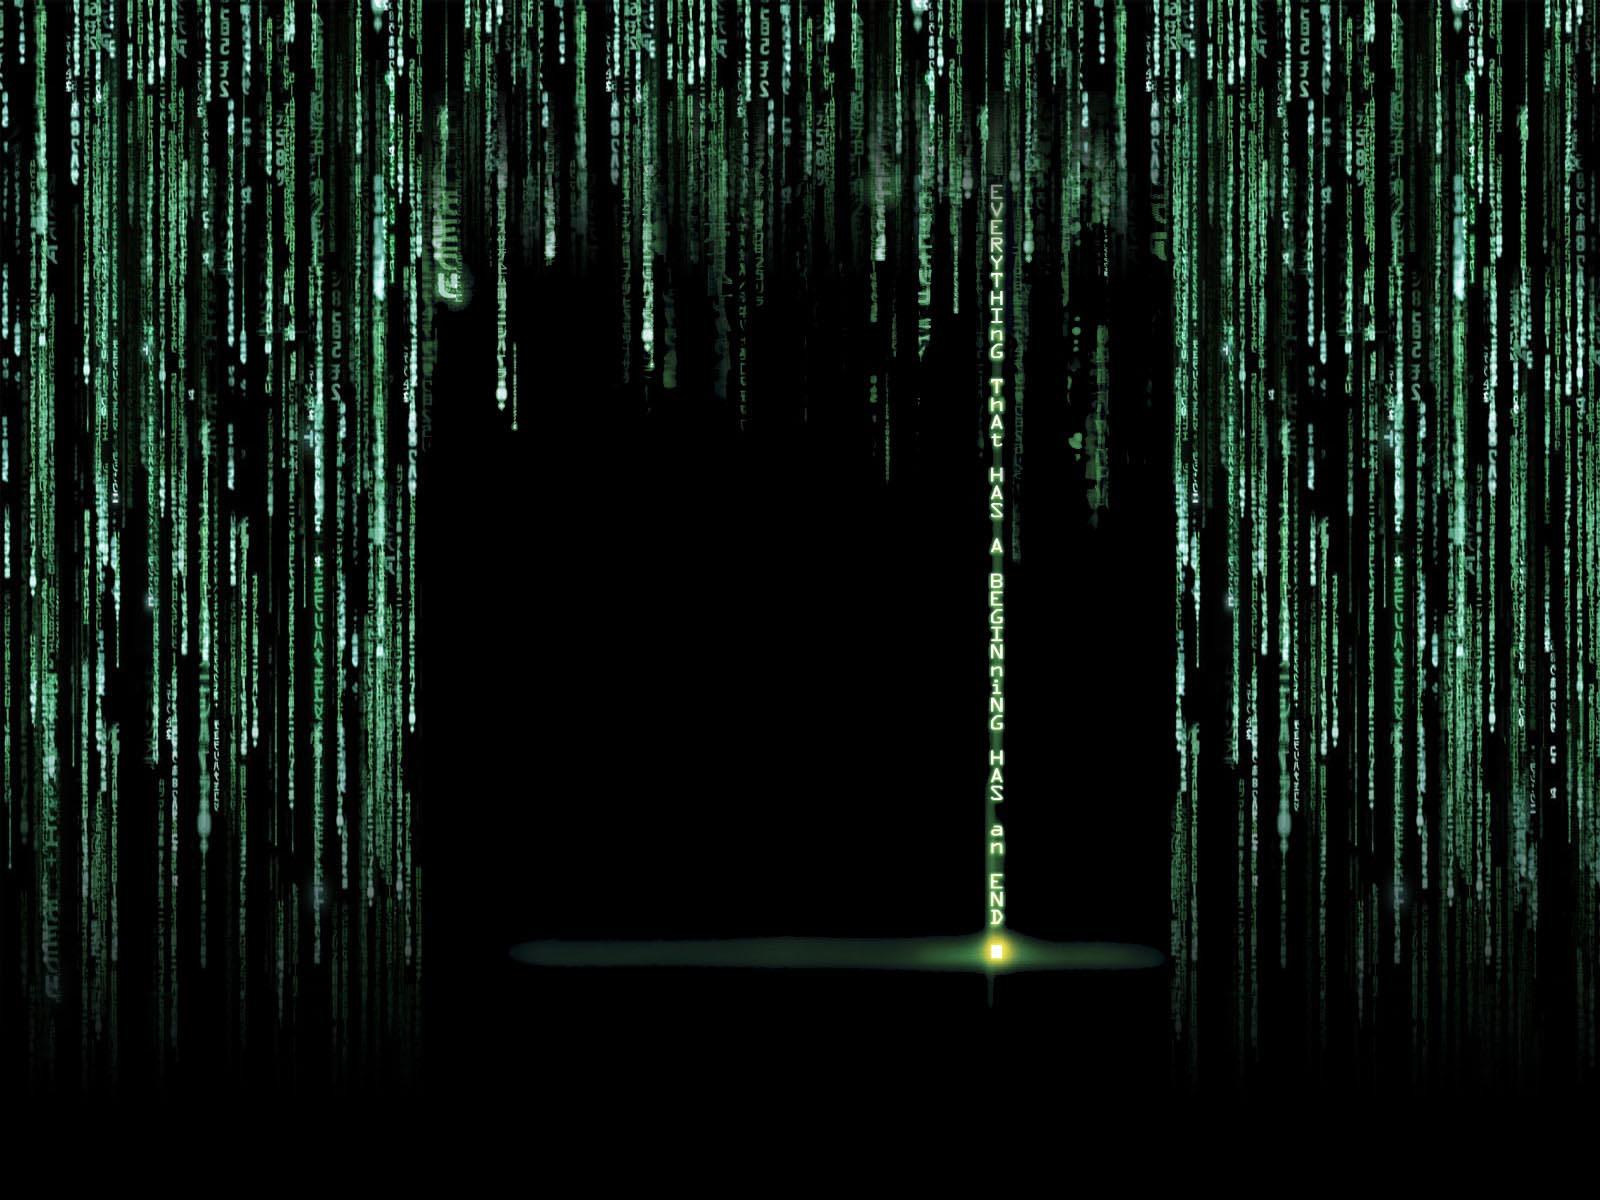 Animated Thanksgiving Wallpaper Download Free Animated Matrix Background Pixelstalk Net